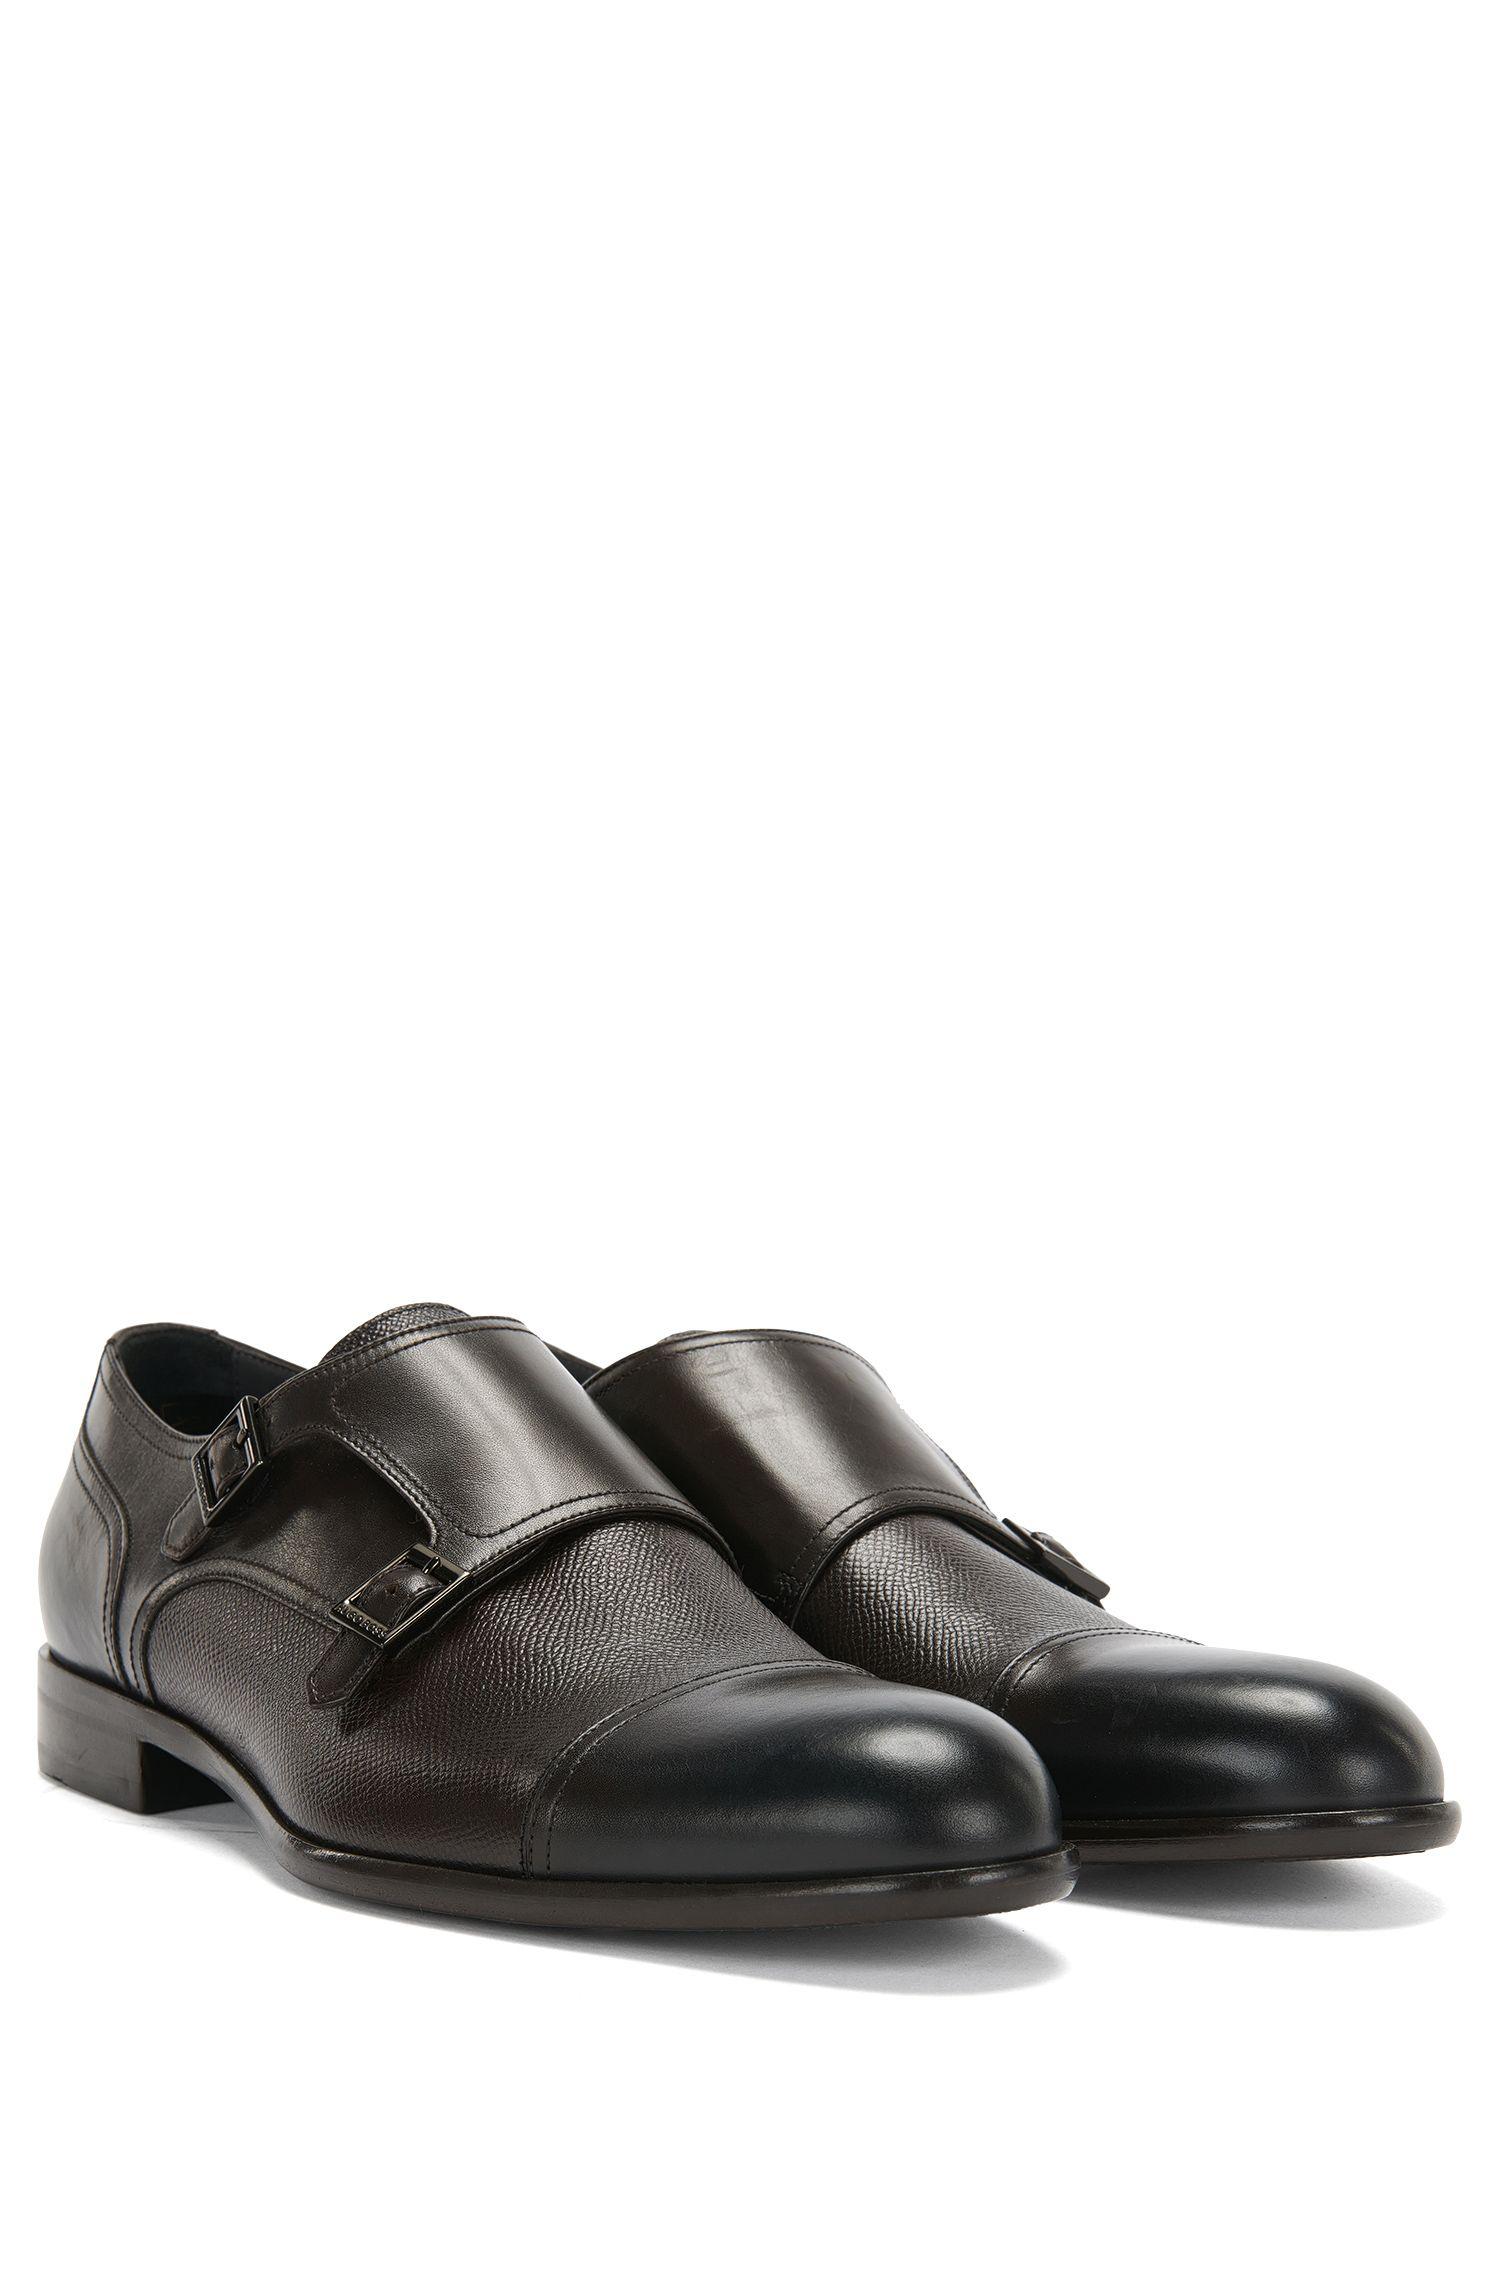 'Manhattan Monk Mxct' | Italian Calfskin Double Monk Strap Dress Shoes